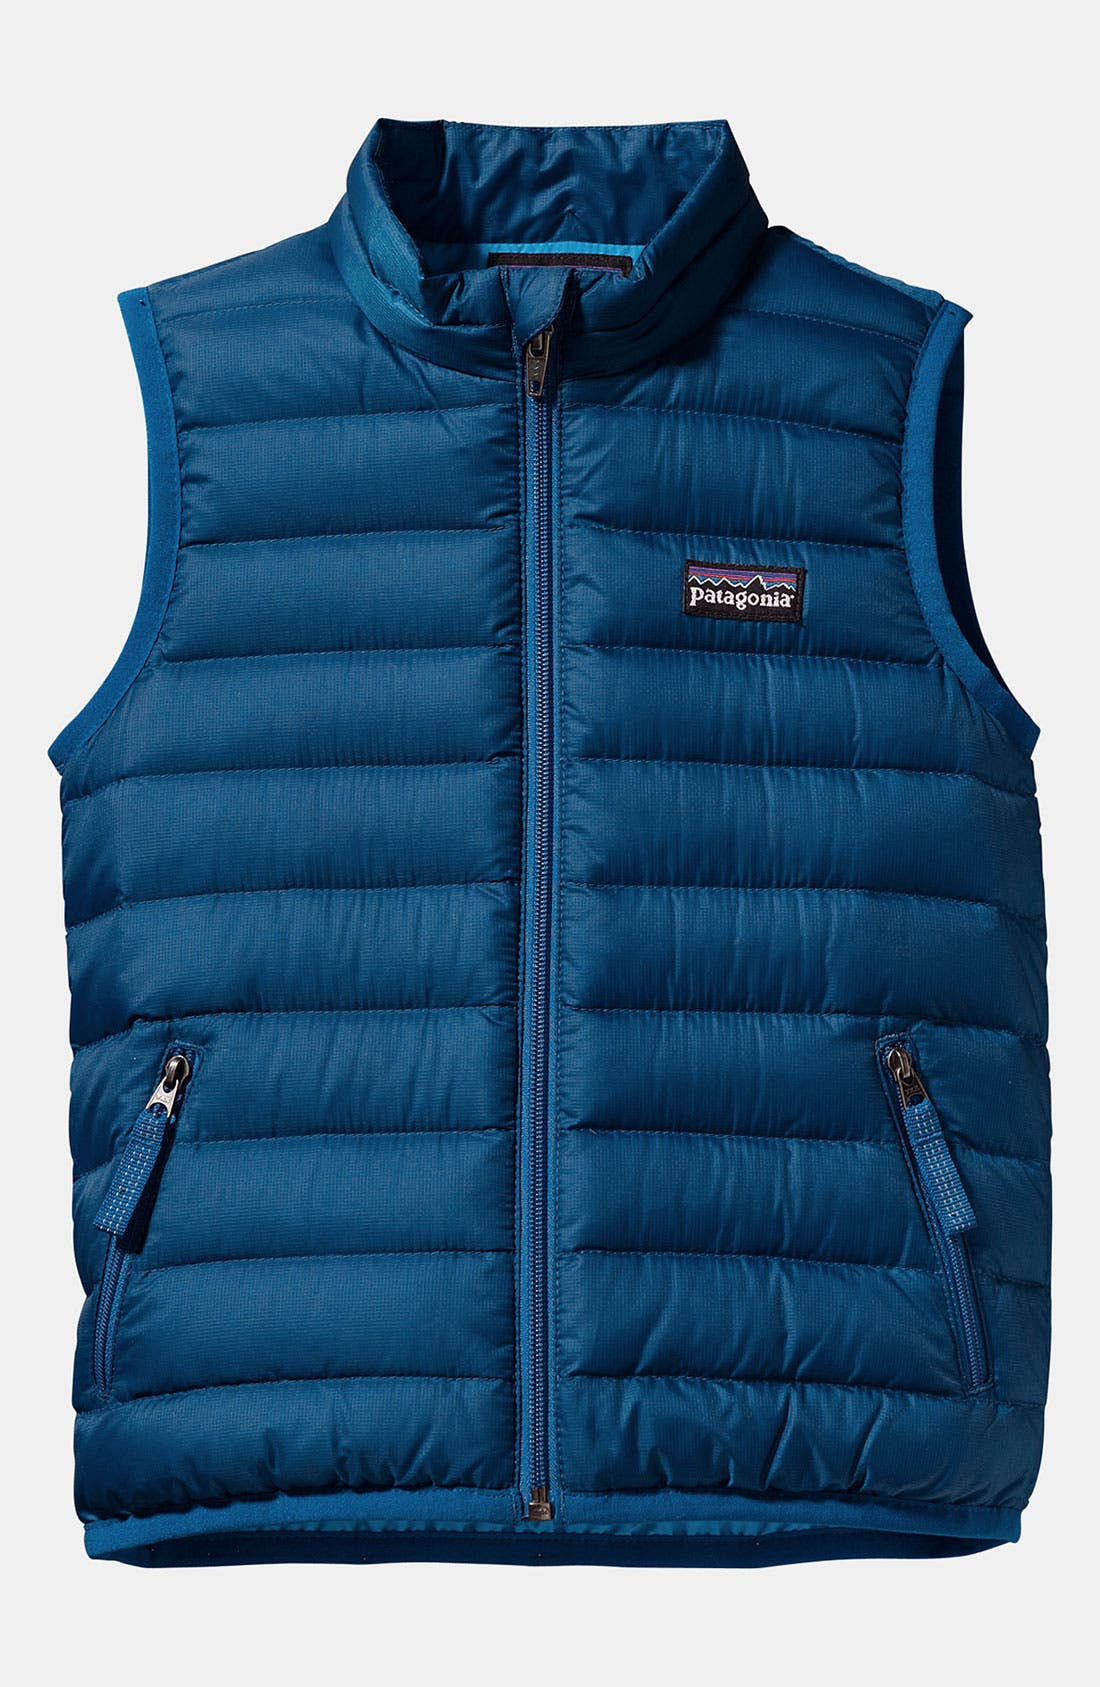 Main Image - Patagonia Down Sweater Vest (Toddler Boys)